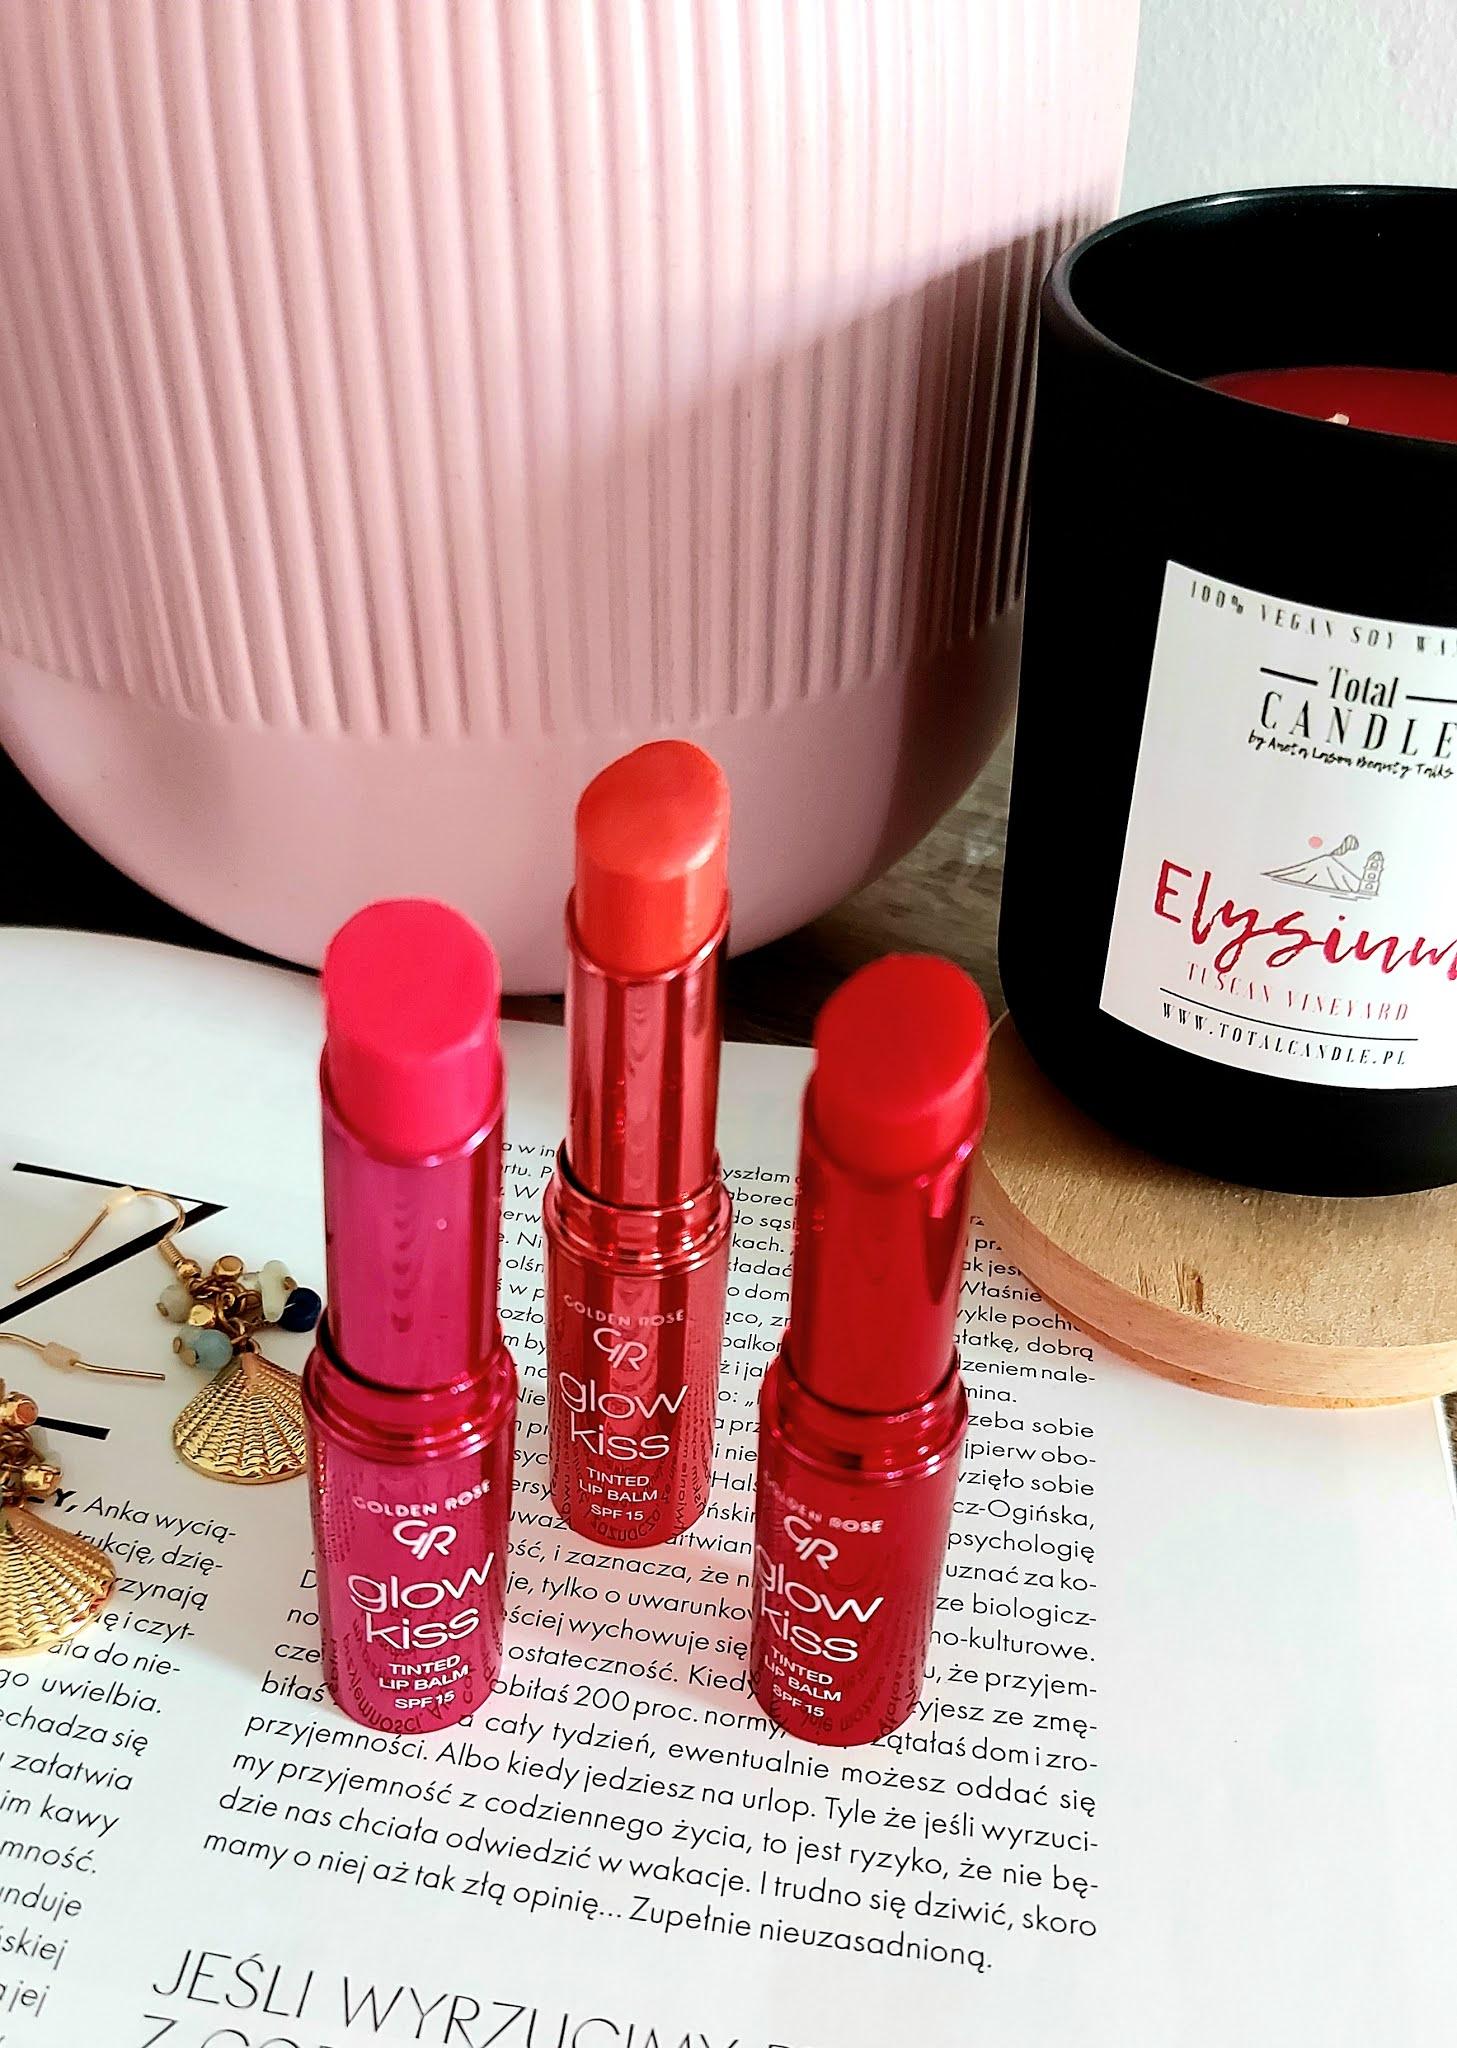 Golden Rose Glow Kiss Tinted Lip Balm - letnie nowości z filtrem spf